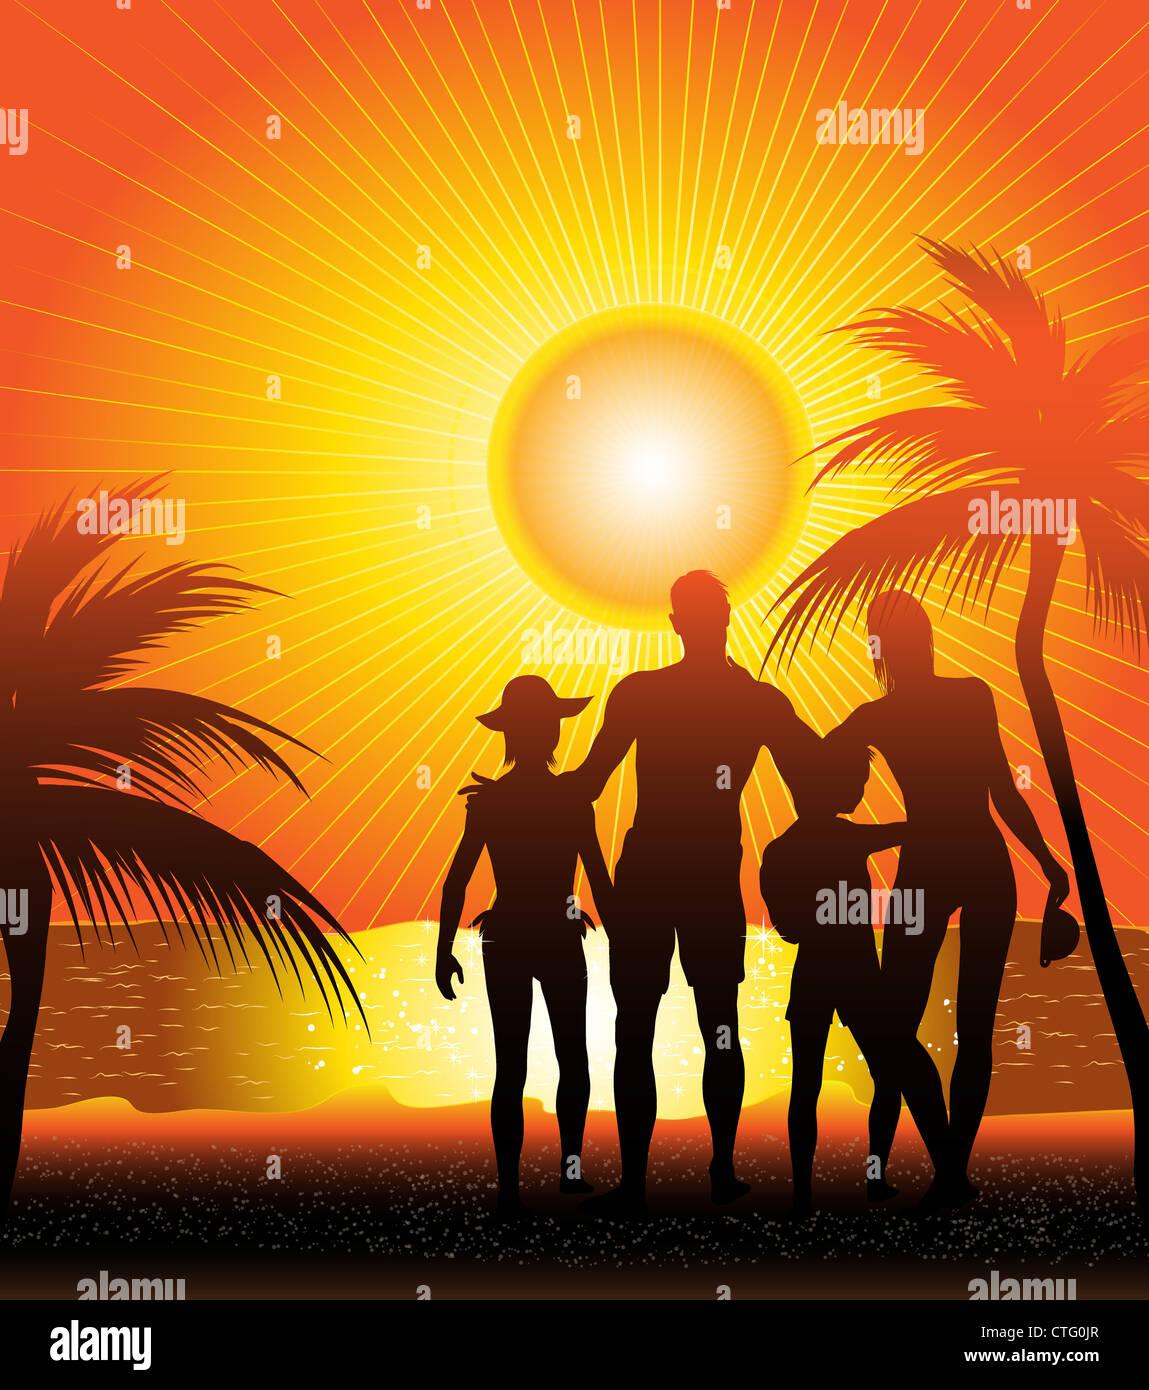 family silhouette on sunset beach Stock Photo